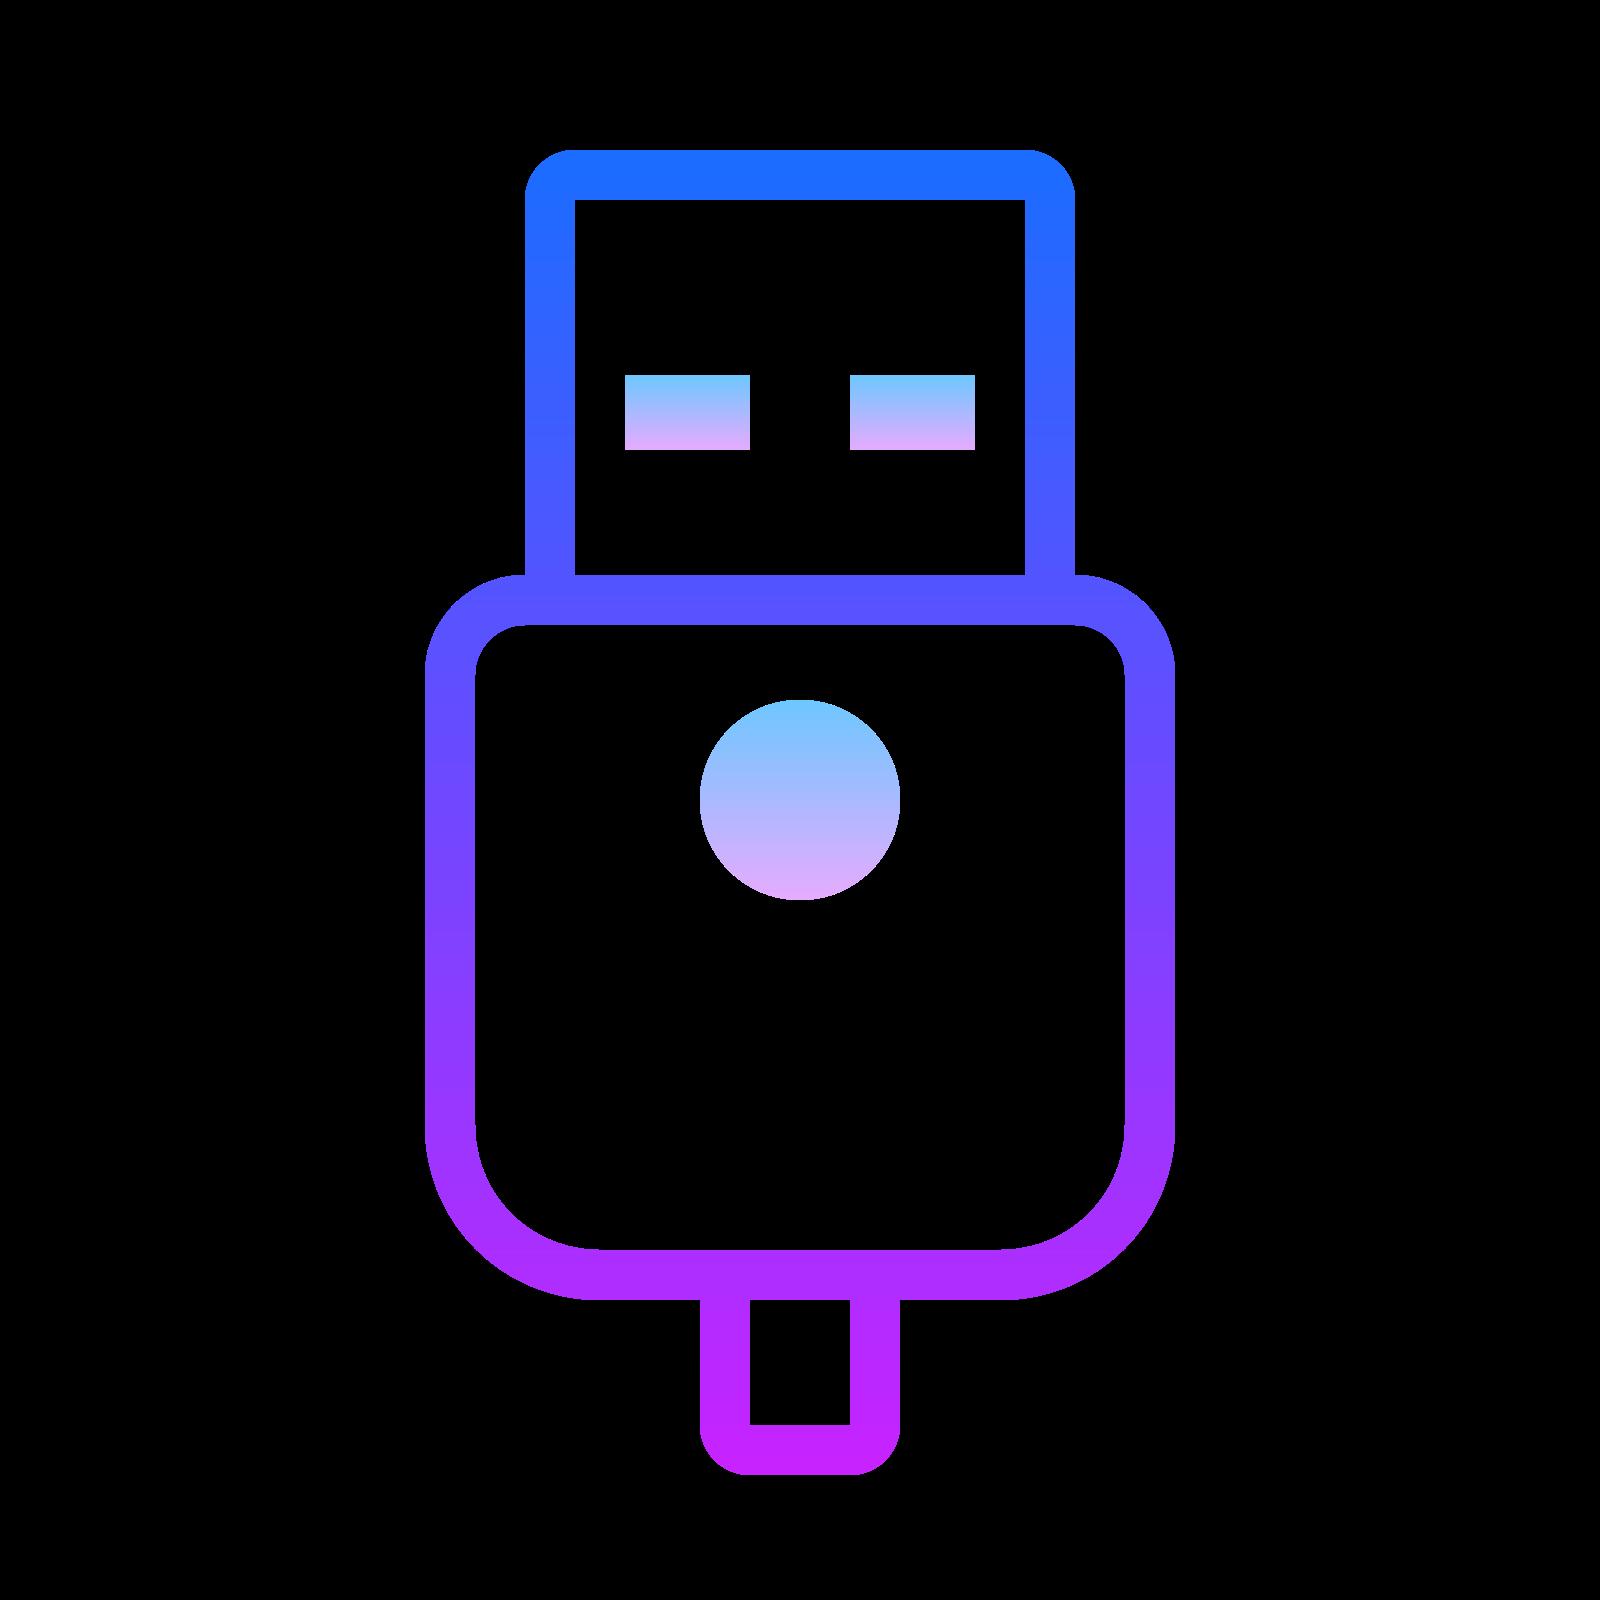 USB aktywne icon